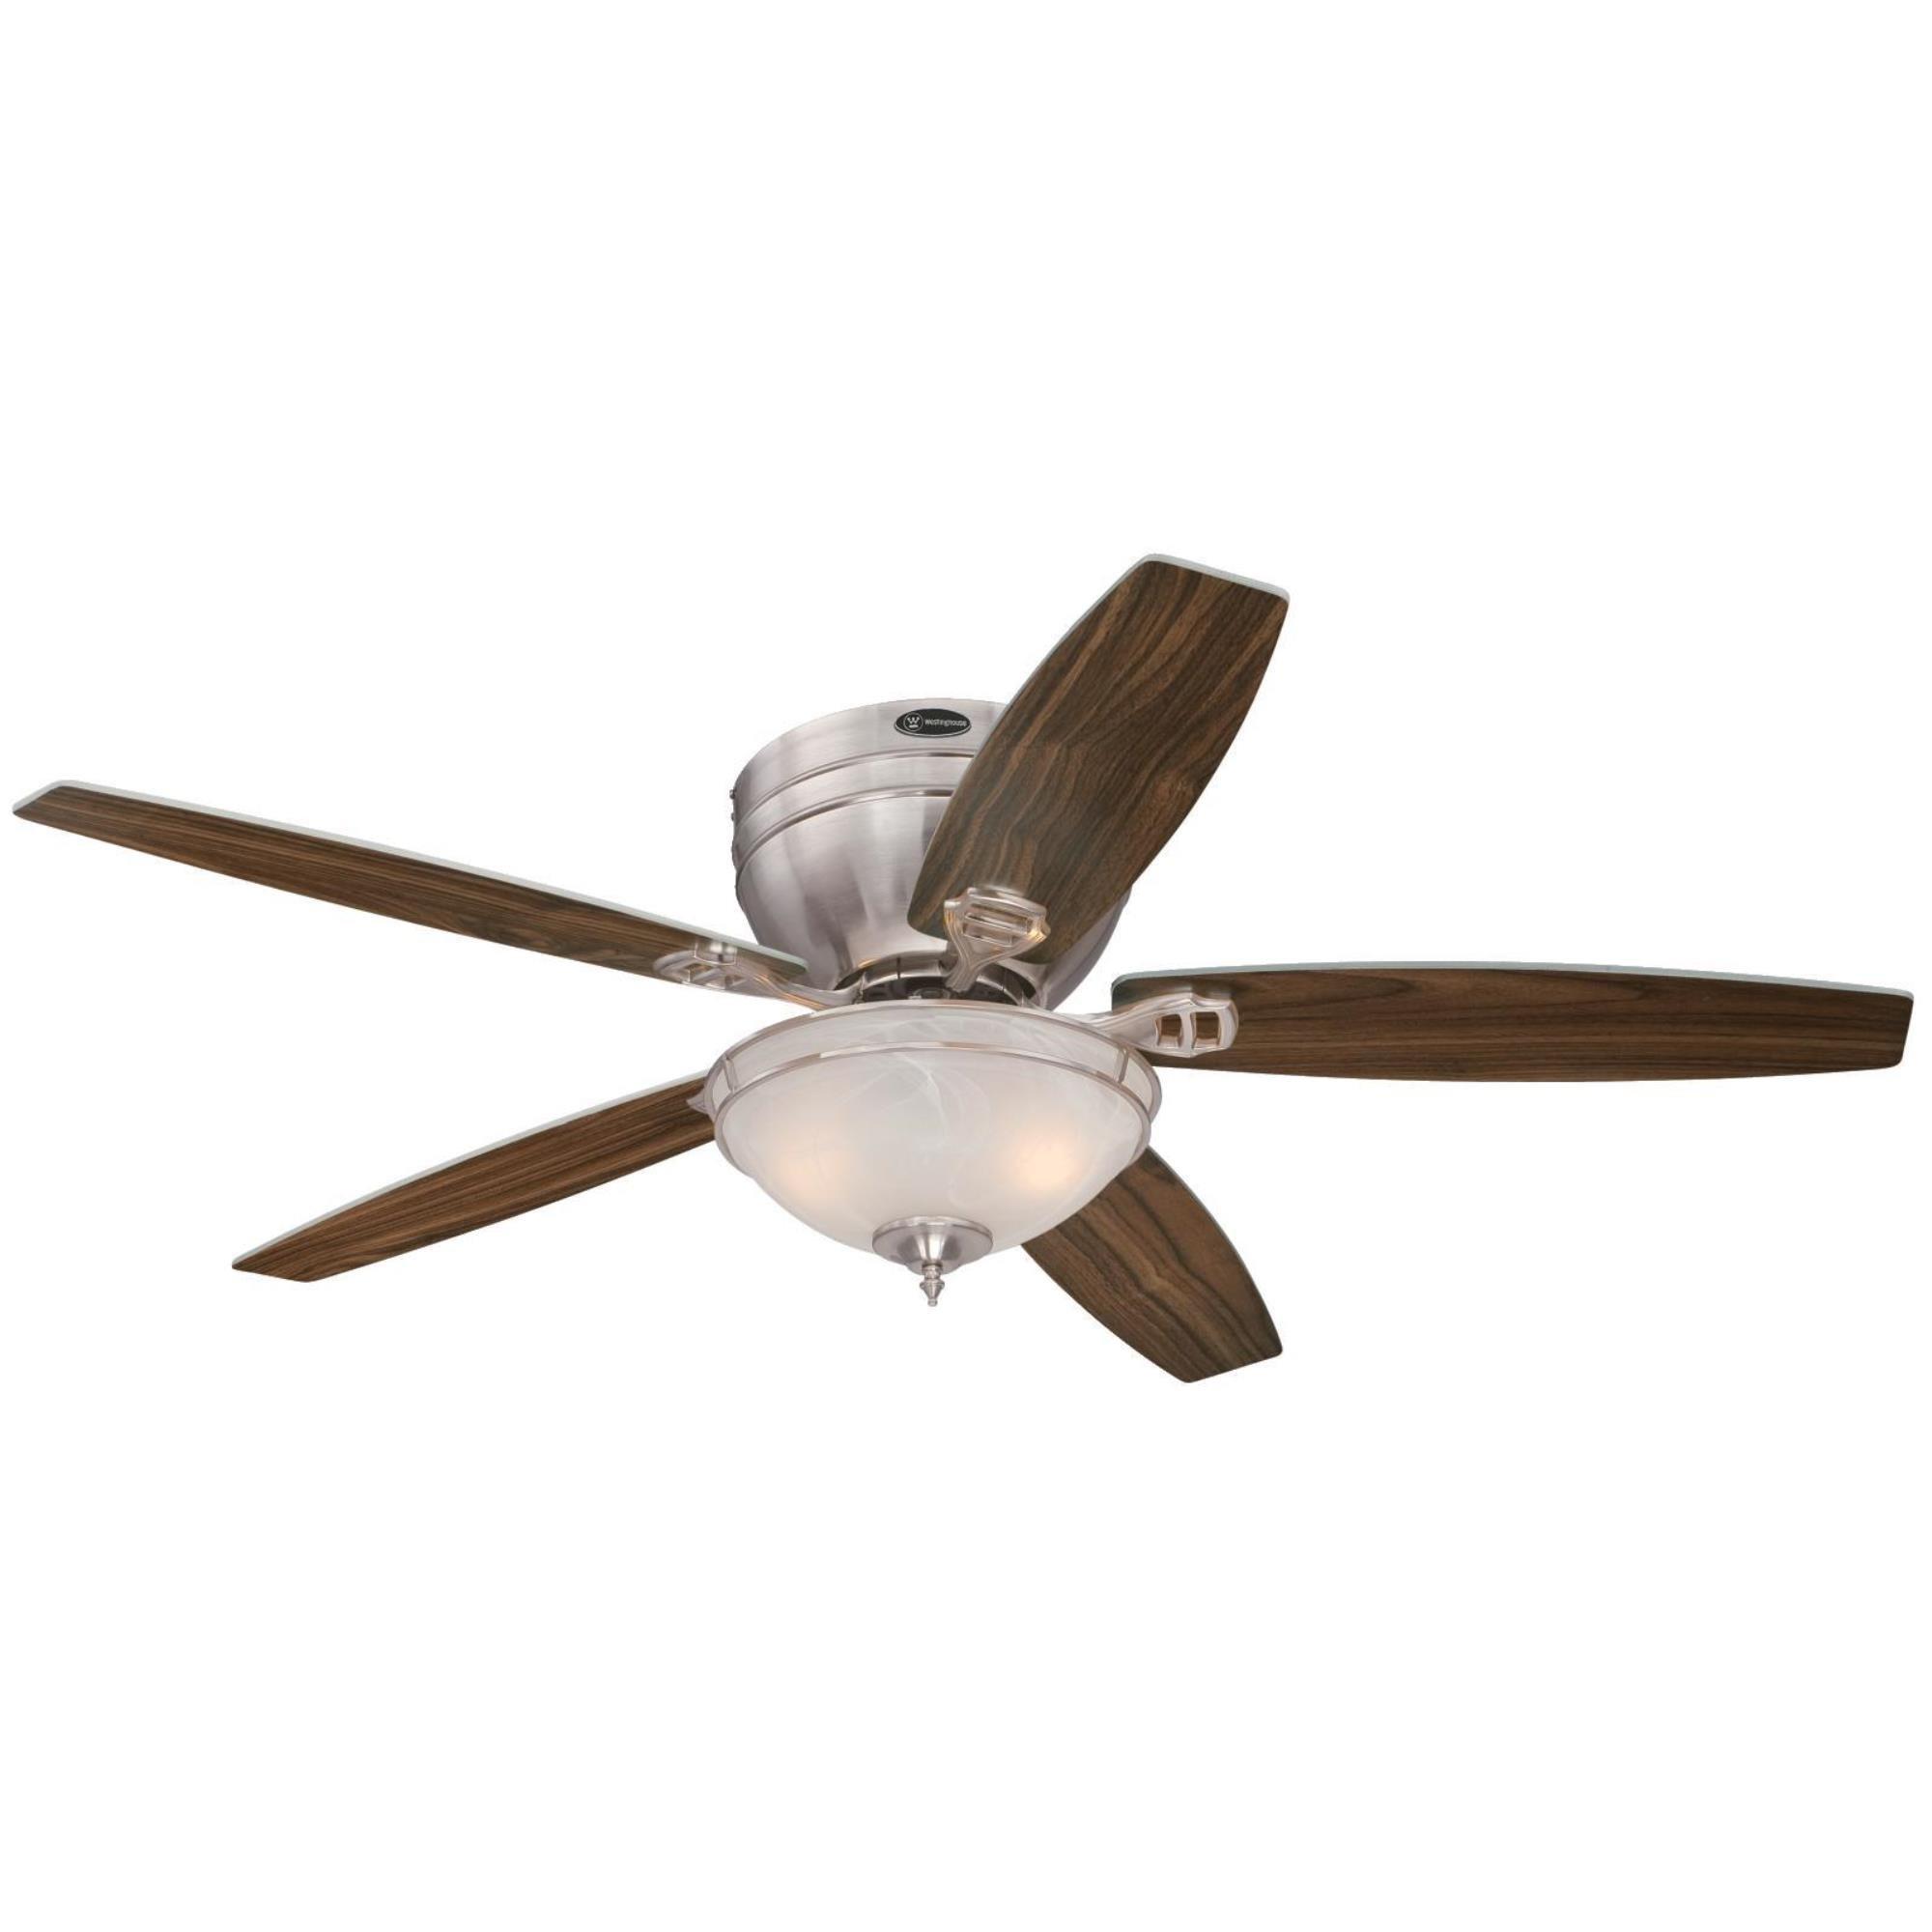 Westinghouse 7209700 Traditional Carolina LED 52 inch Brushed Nickel Indoor Ceiling Fan, LED Light Kit with White Alabaster Bowl